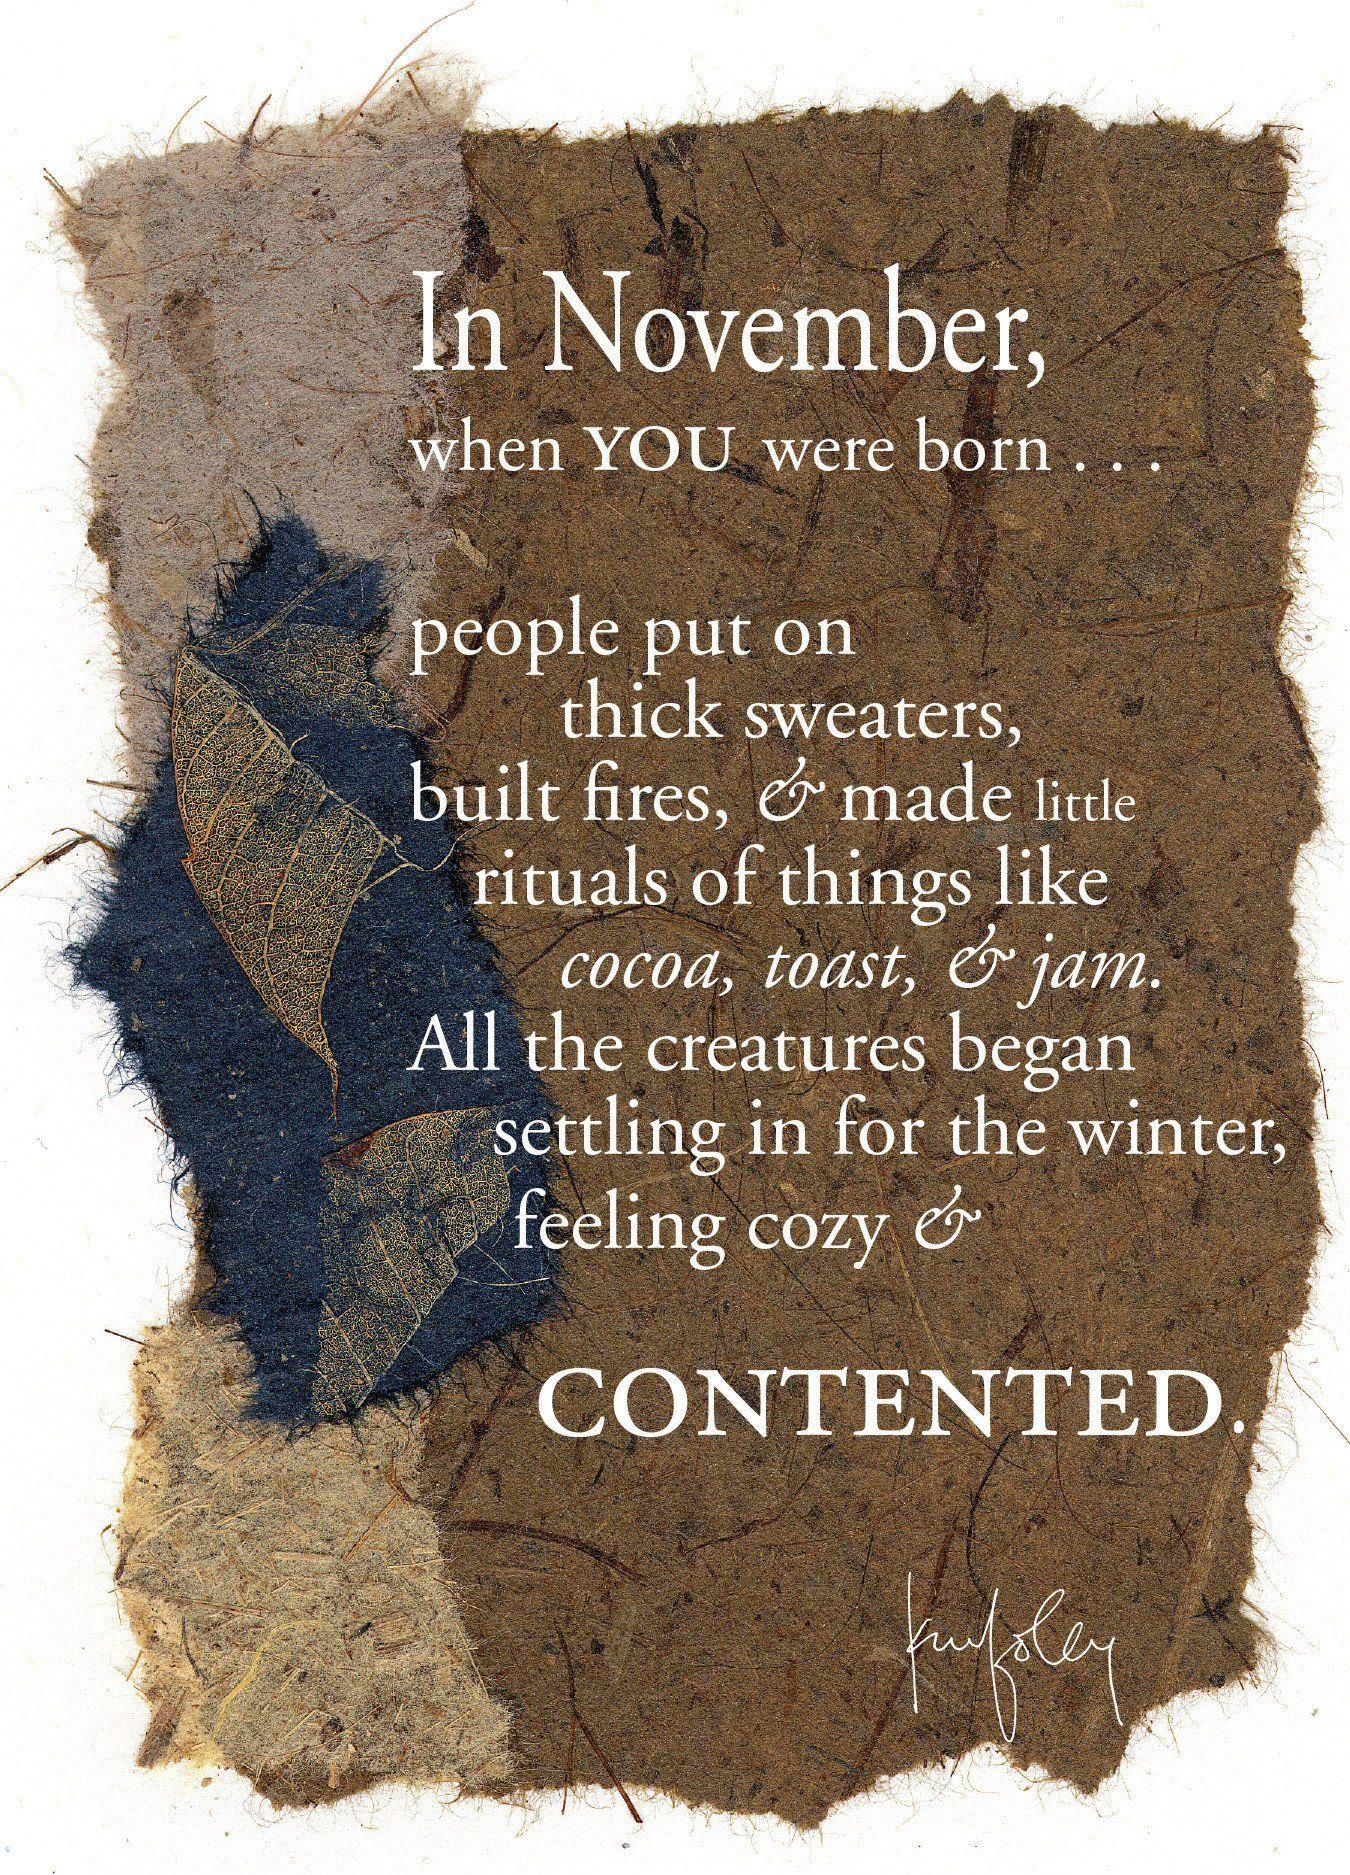 BD131 November Birthday November birthday, November born